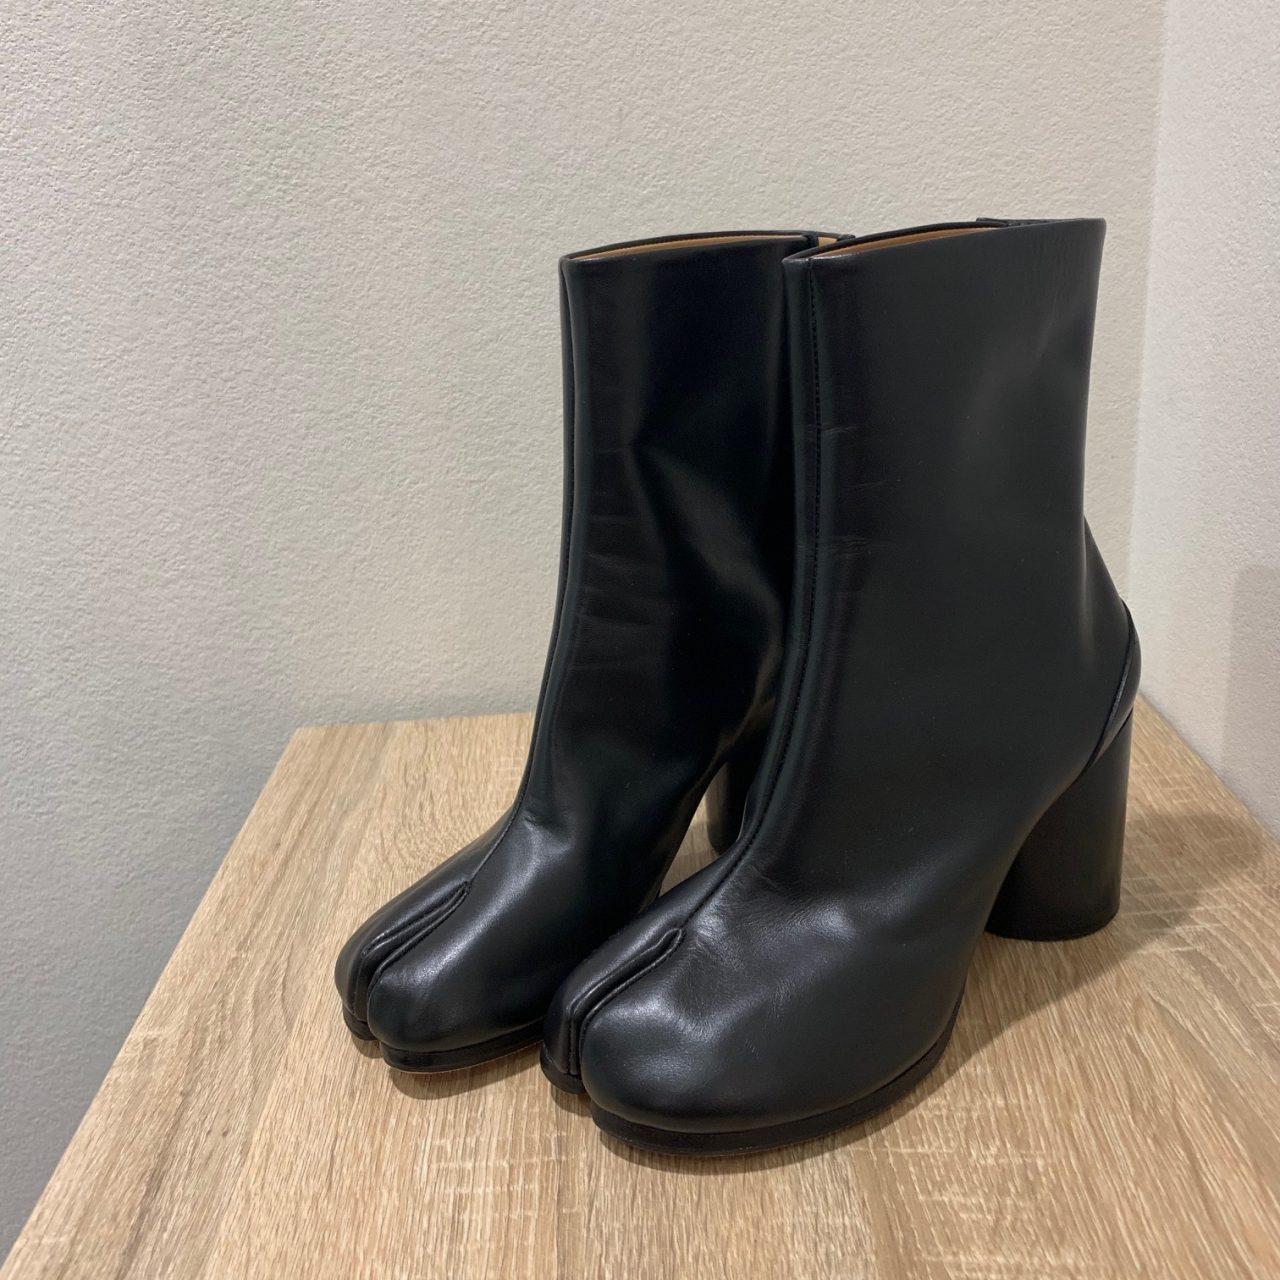 Maison Margiela22 19SS Tabi Boots